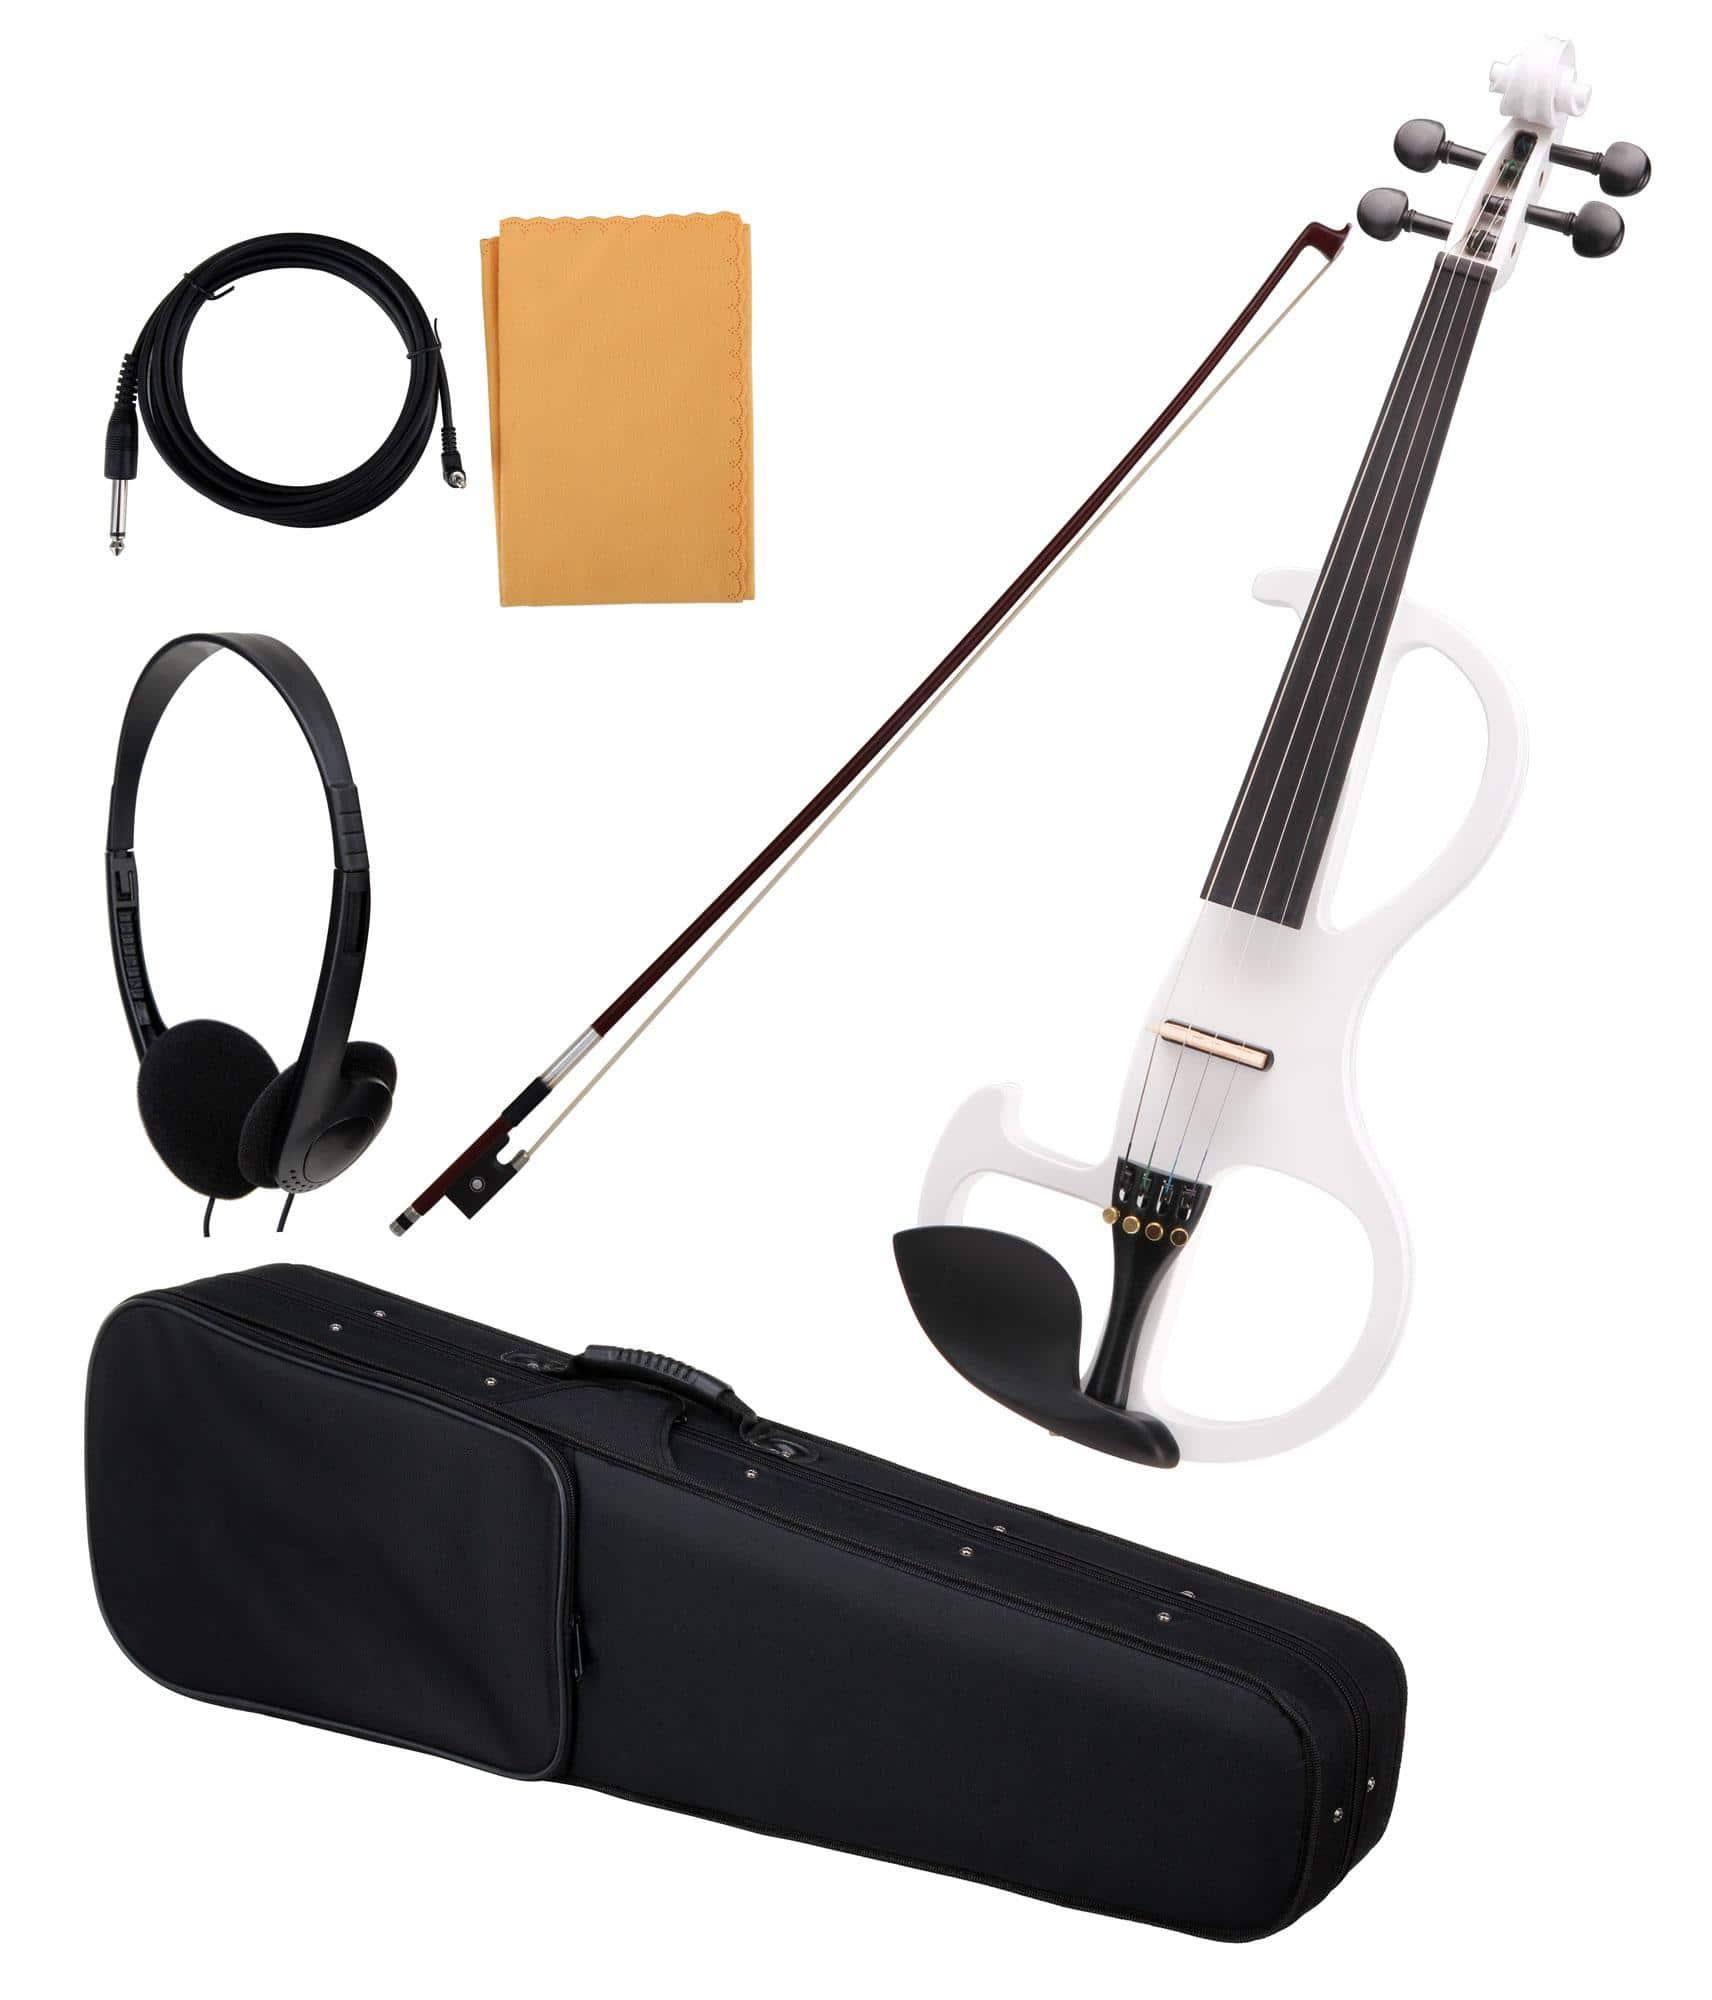 Violinen - Classic Cantabile EV 90WH 4|4 E Violine weiß - Onlineshop Musikhaus Kirstein